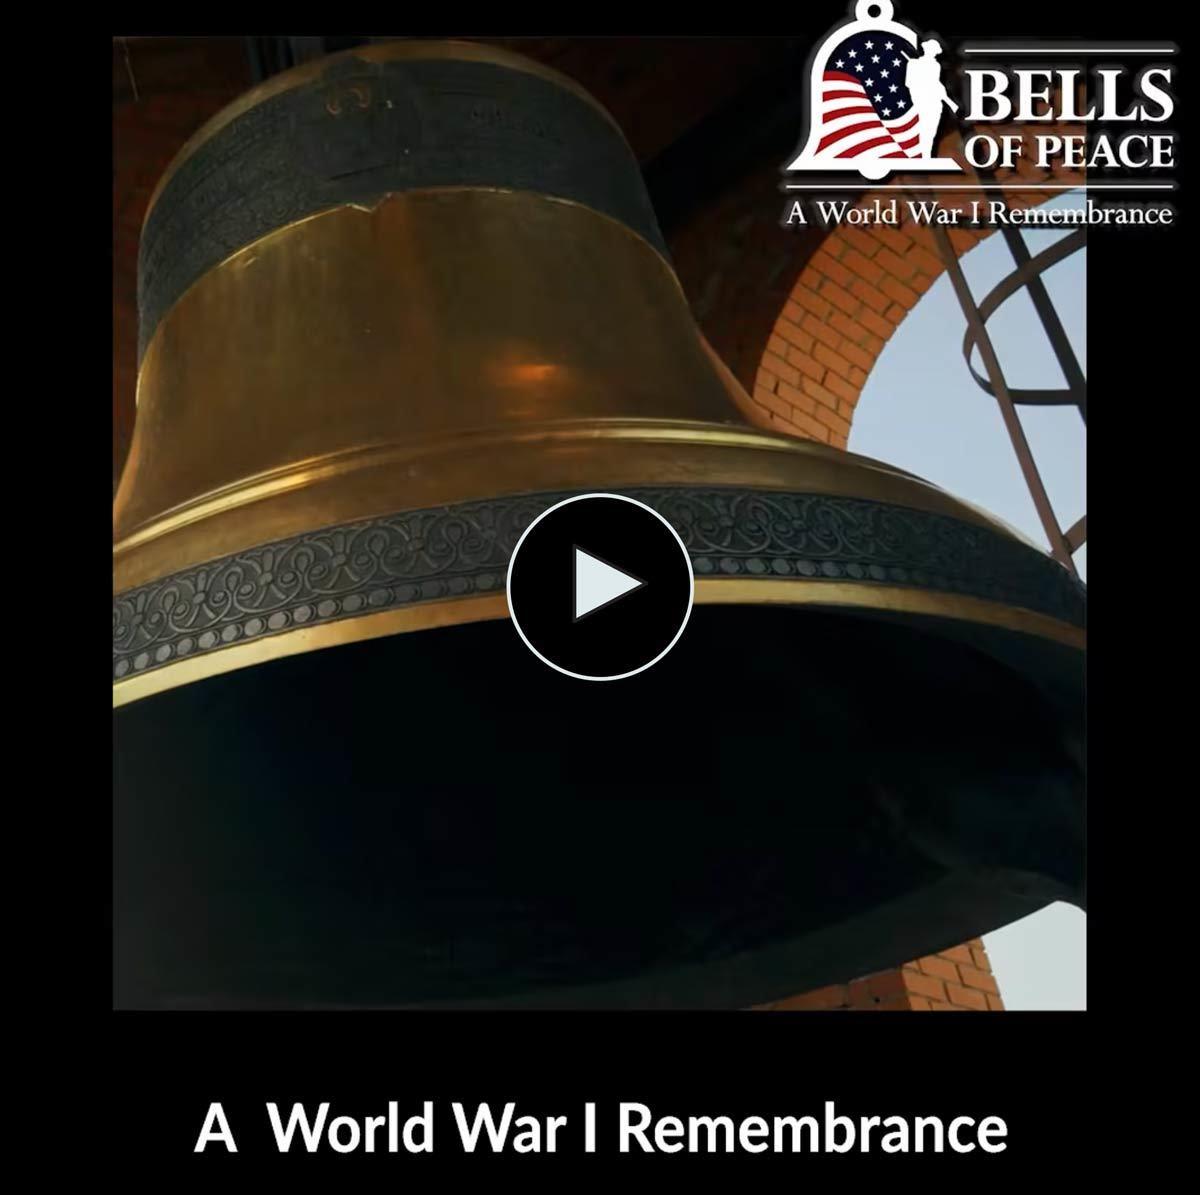 Bells of Peace promo video thumb 2021